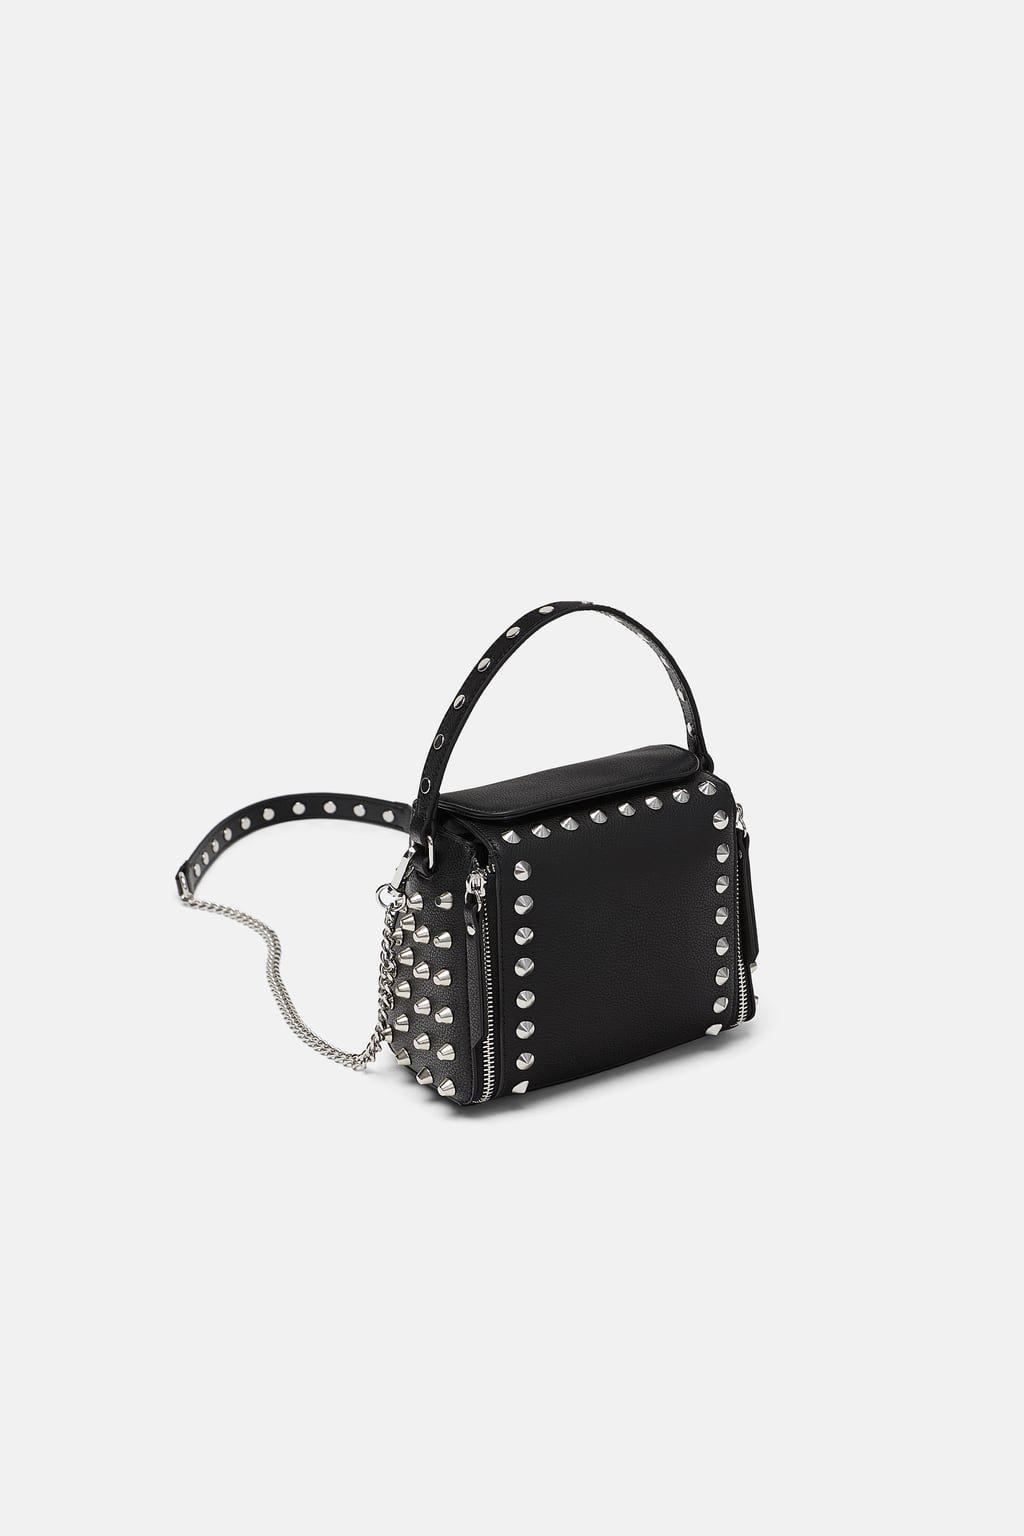 Image 1 Of Rocker Crossbody Bag From Zara Bags Black